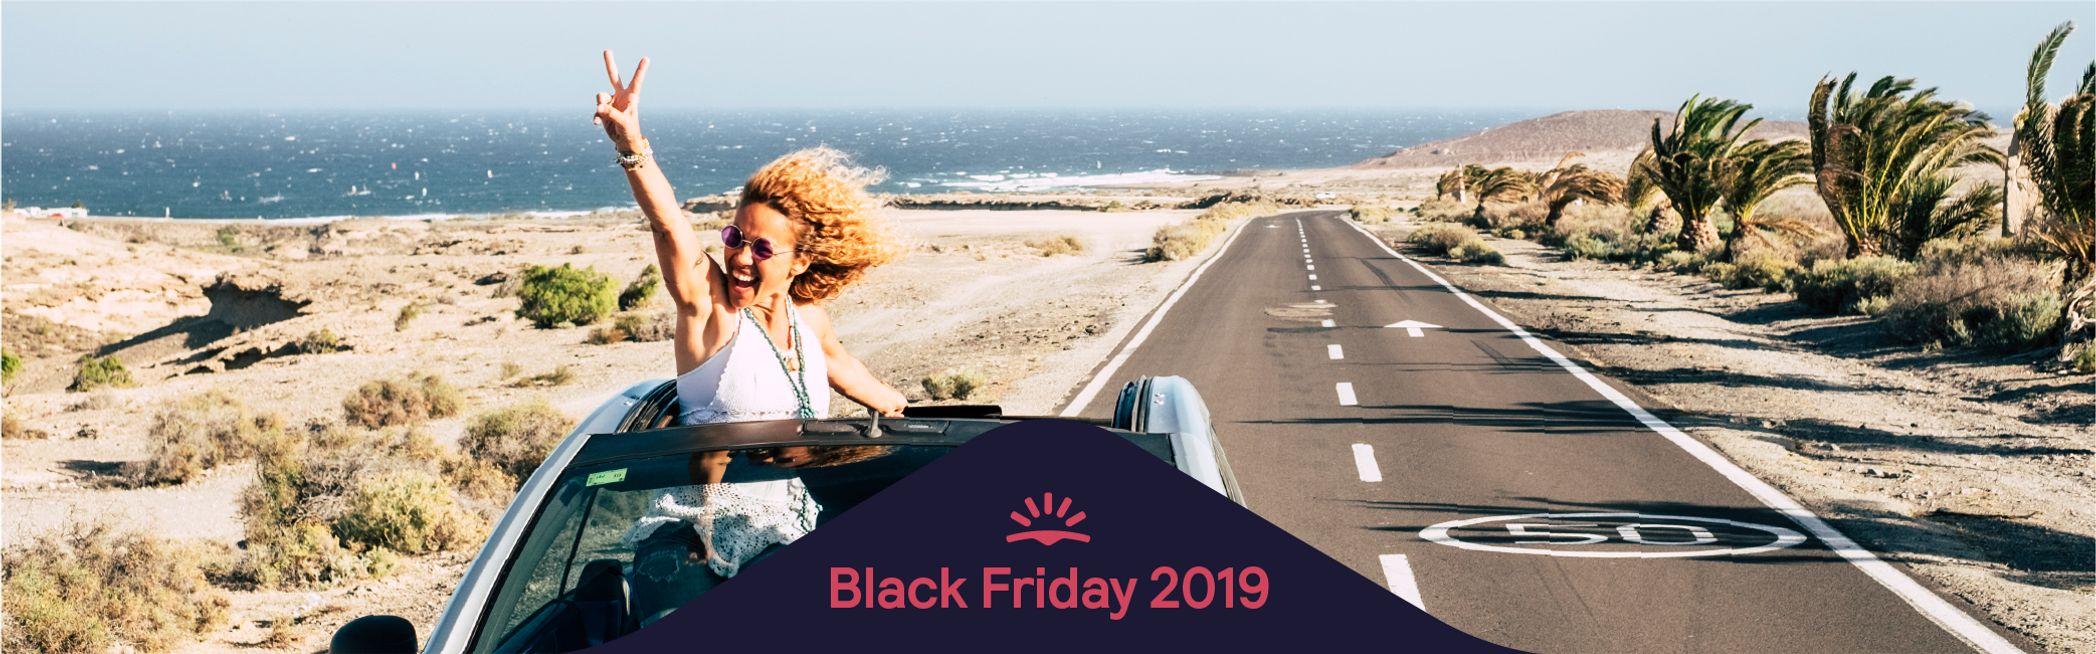 Norwegian Air Black Friday Flight Deals 2019 From The U S Skyscanner